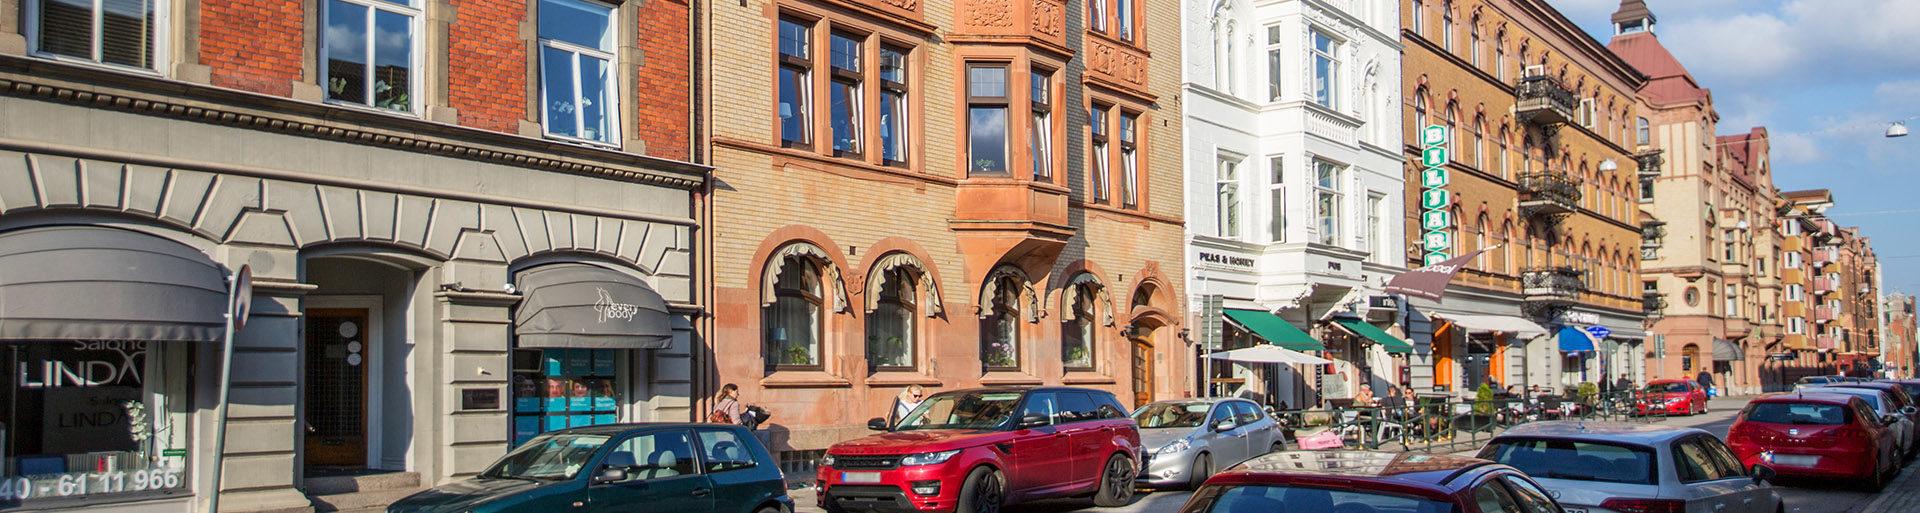 Franshill Stora Nygatan 21 Malmö